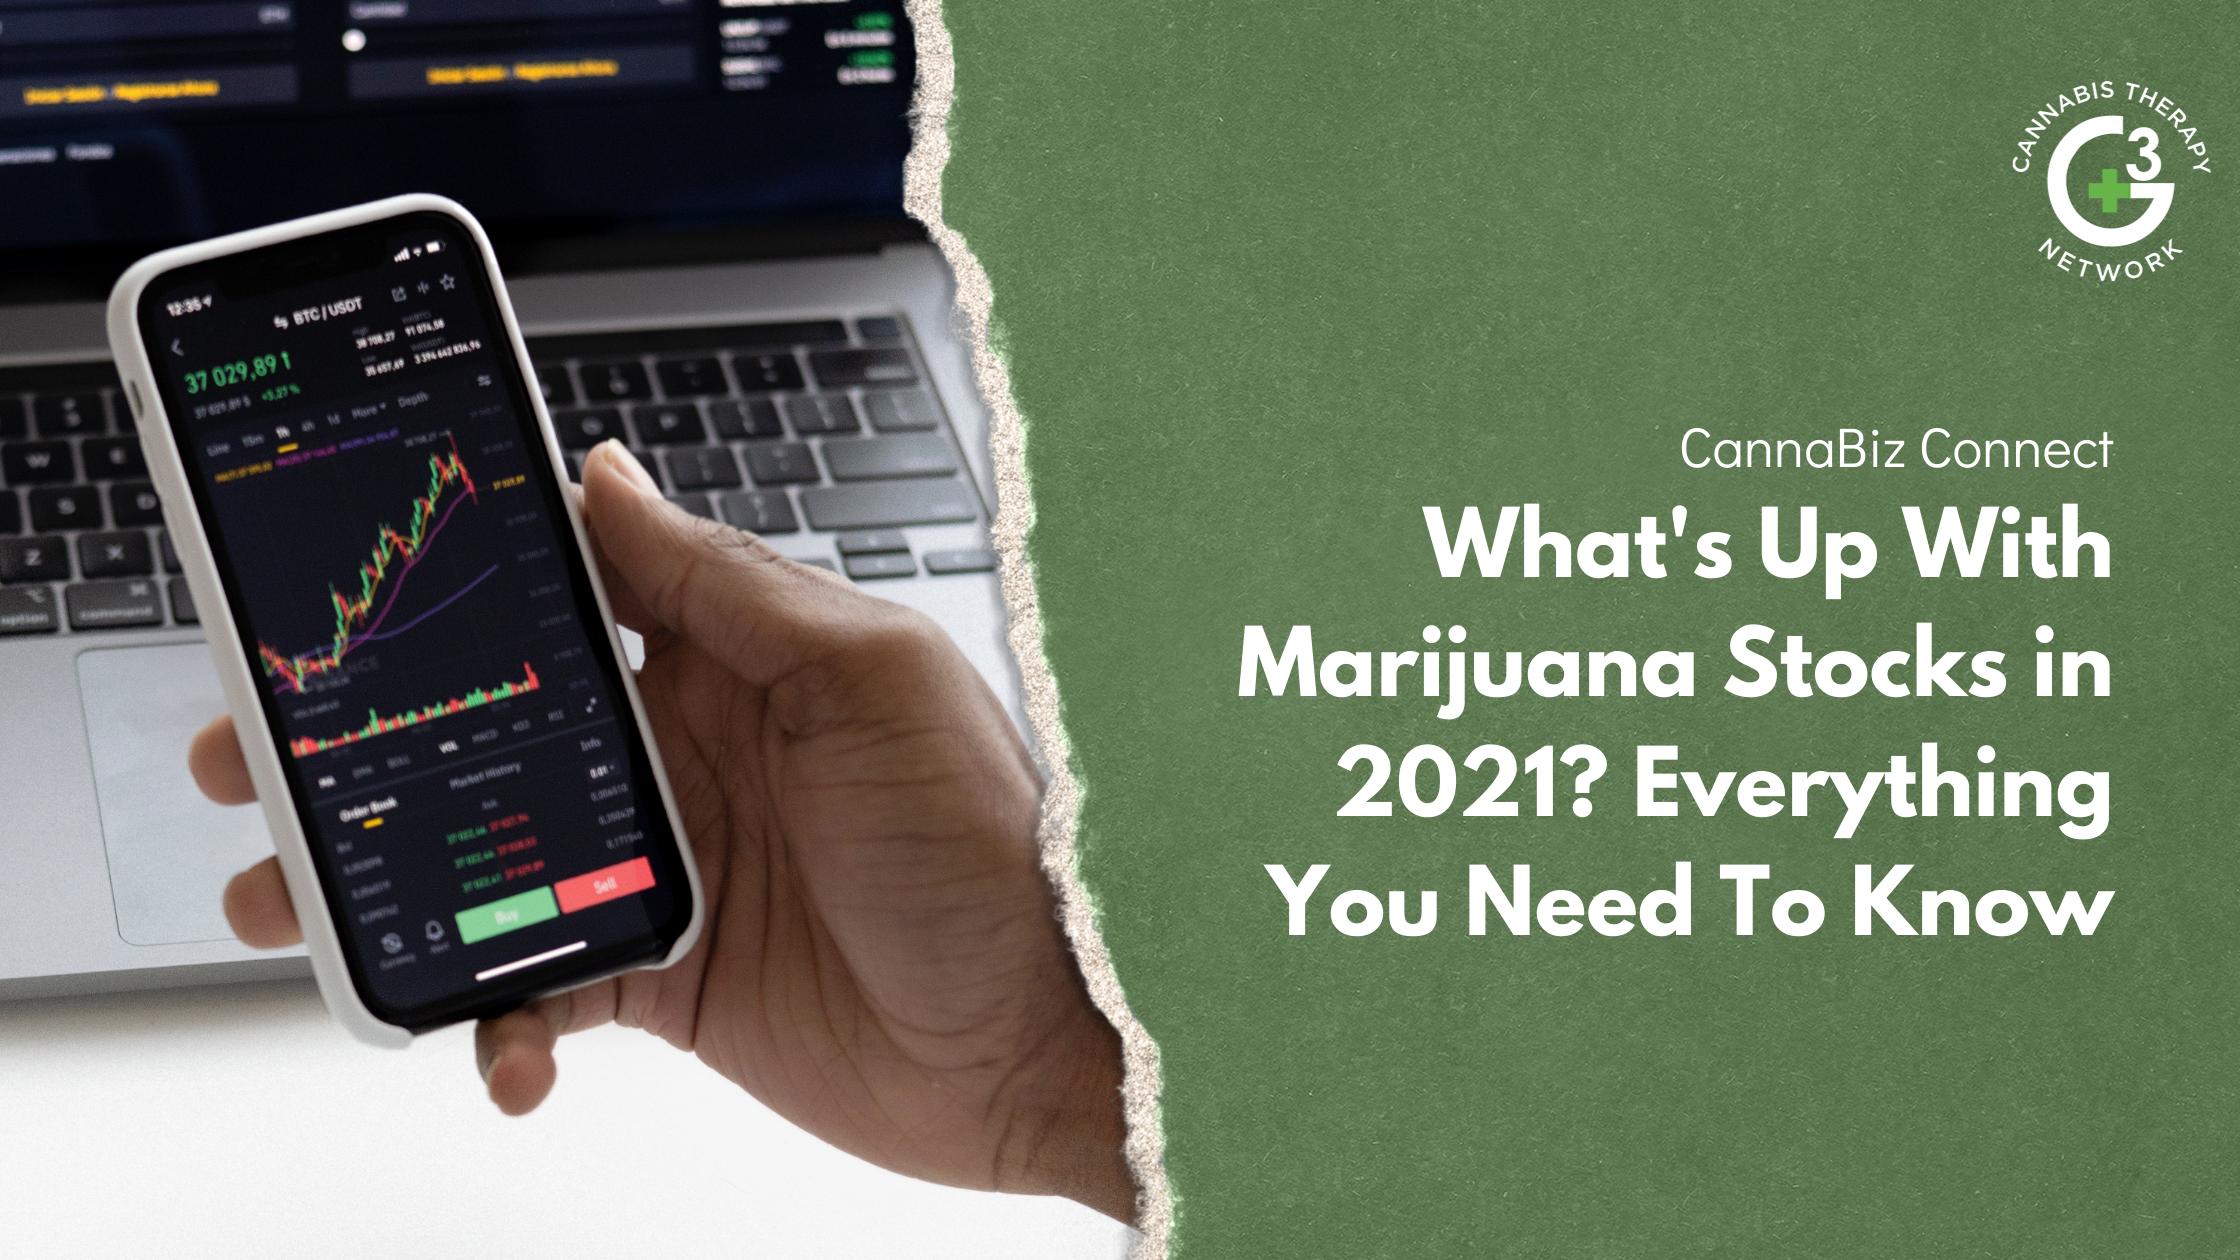 Marijuana Stocks in 2021 - Everything You Need To Know